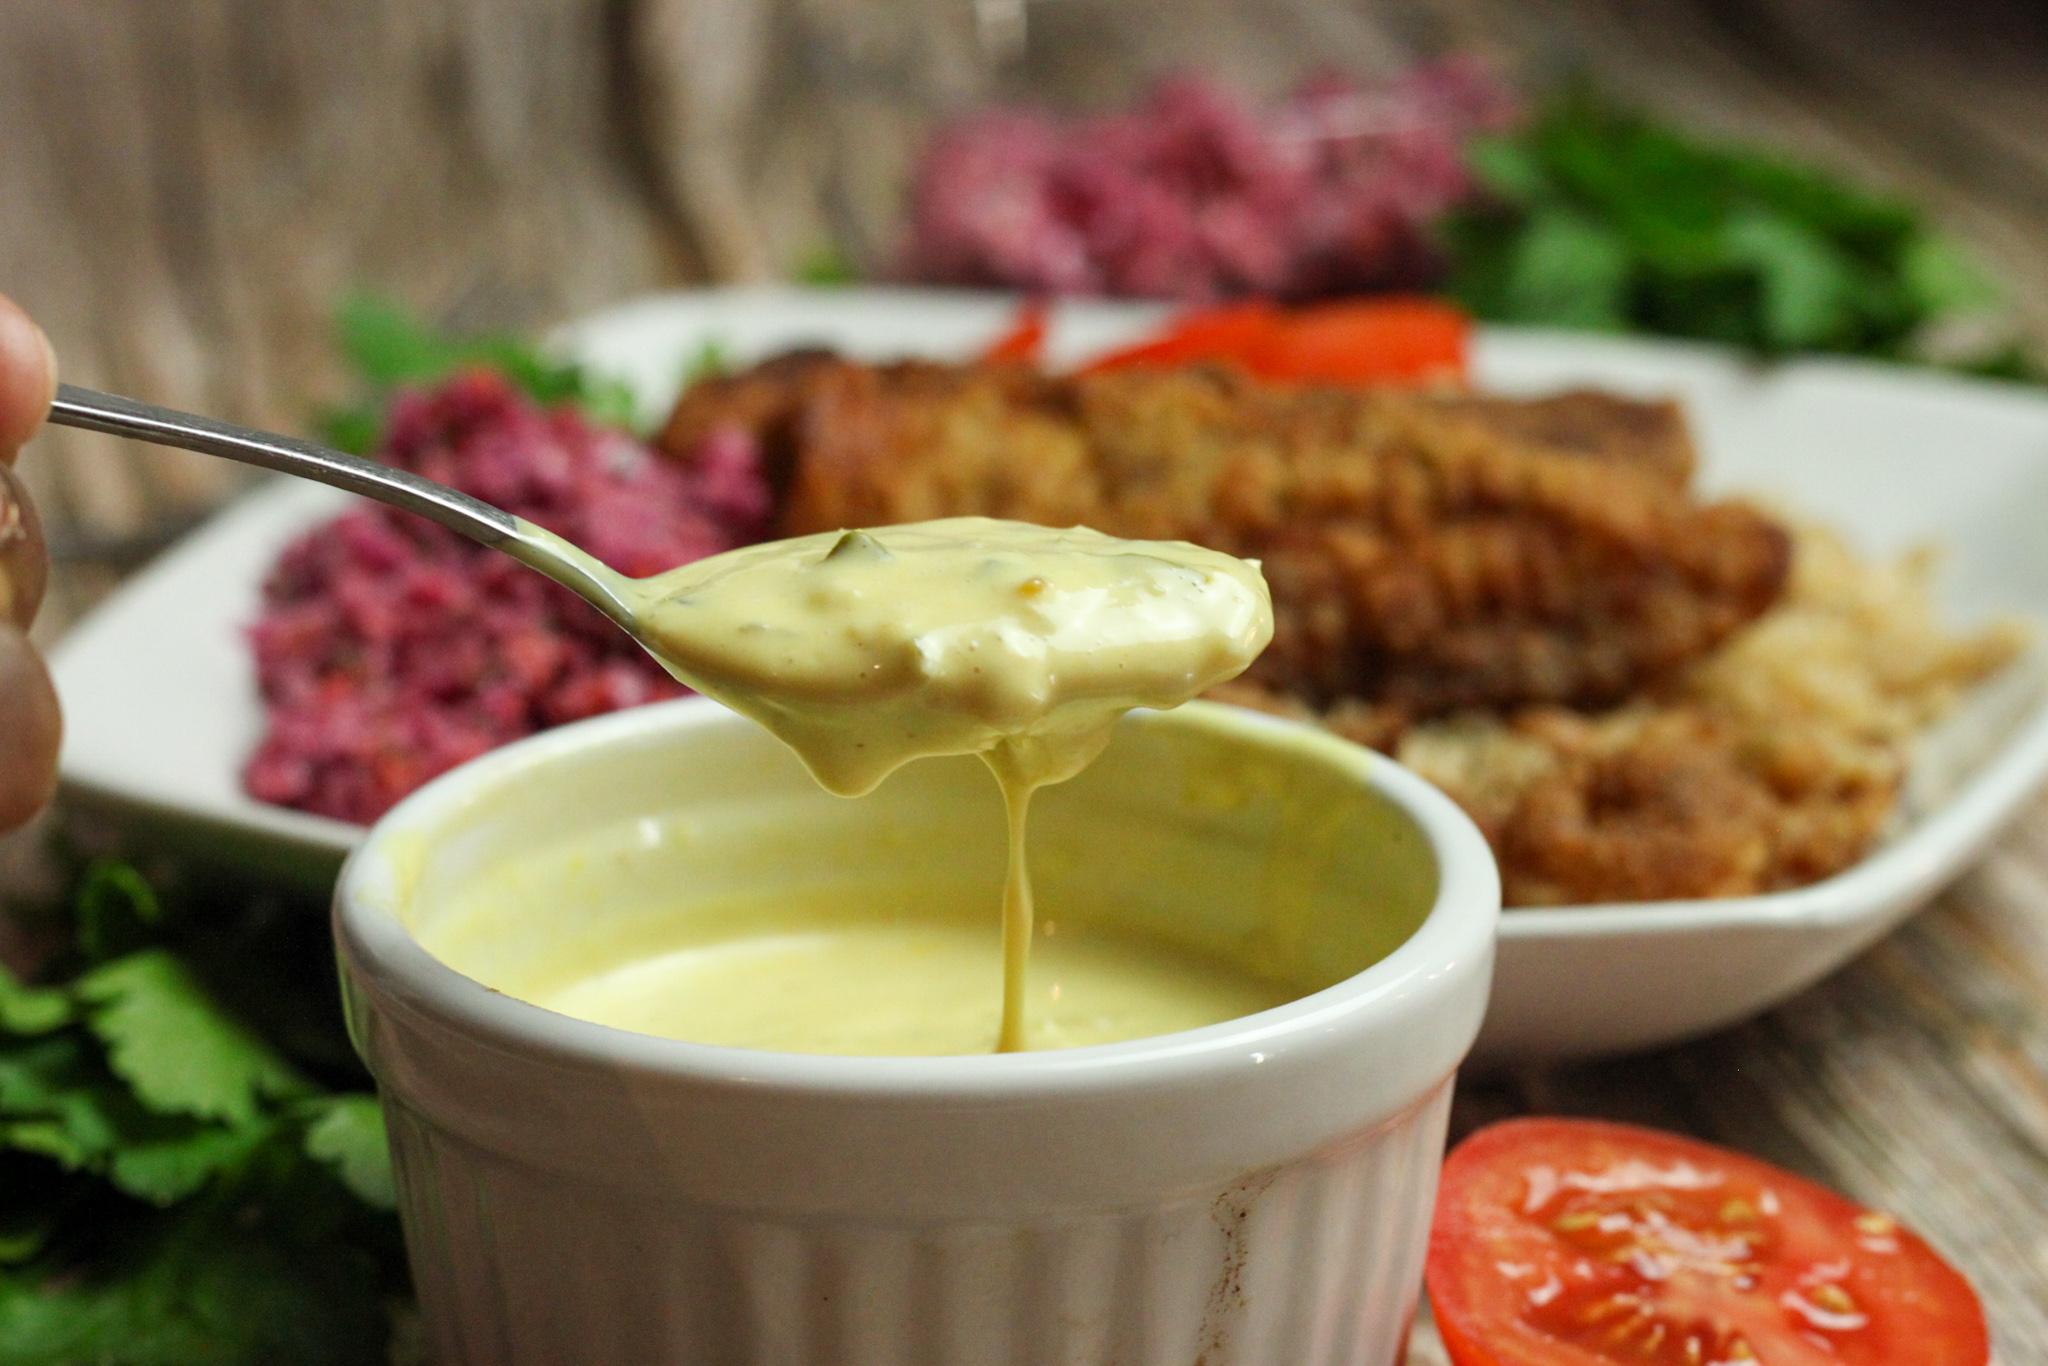 Bermuda Creamy Tartar Sauce